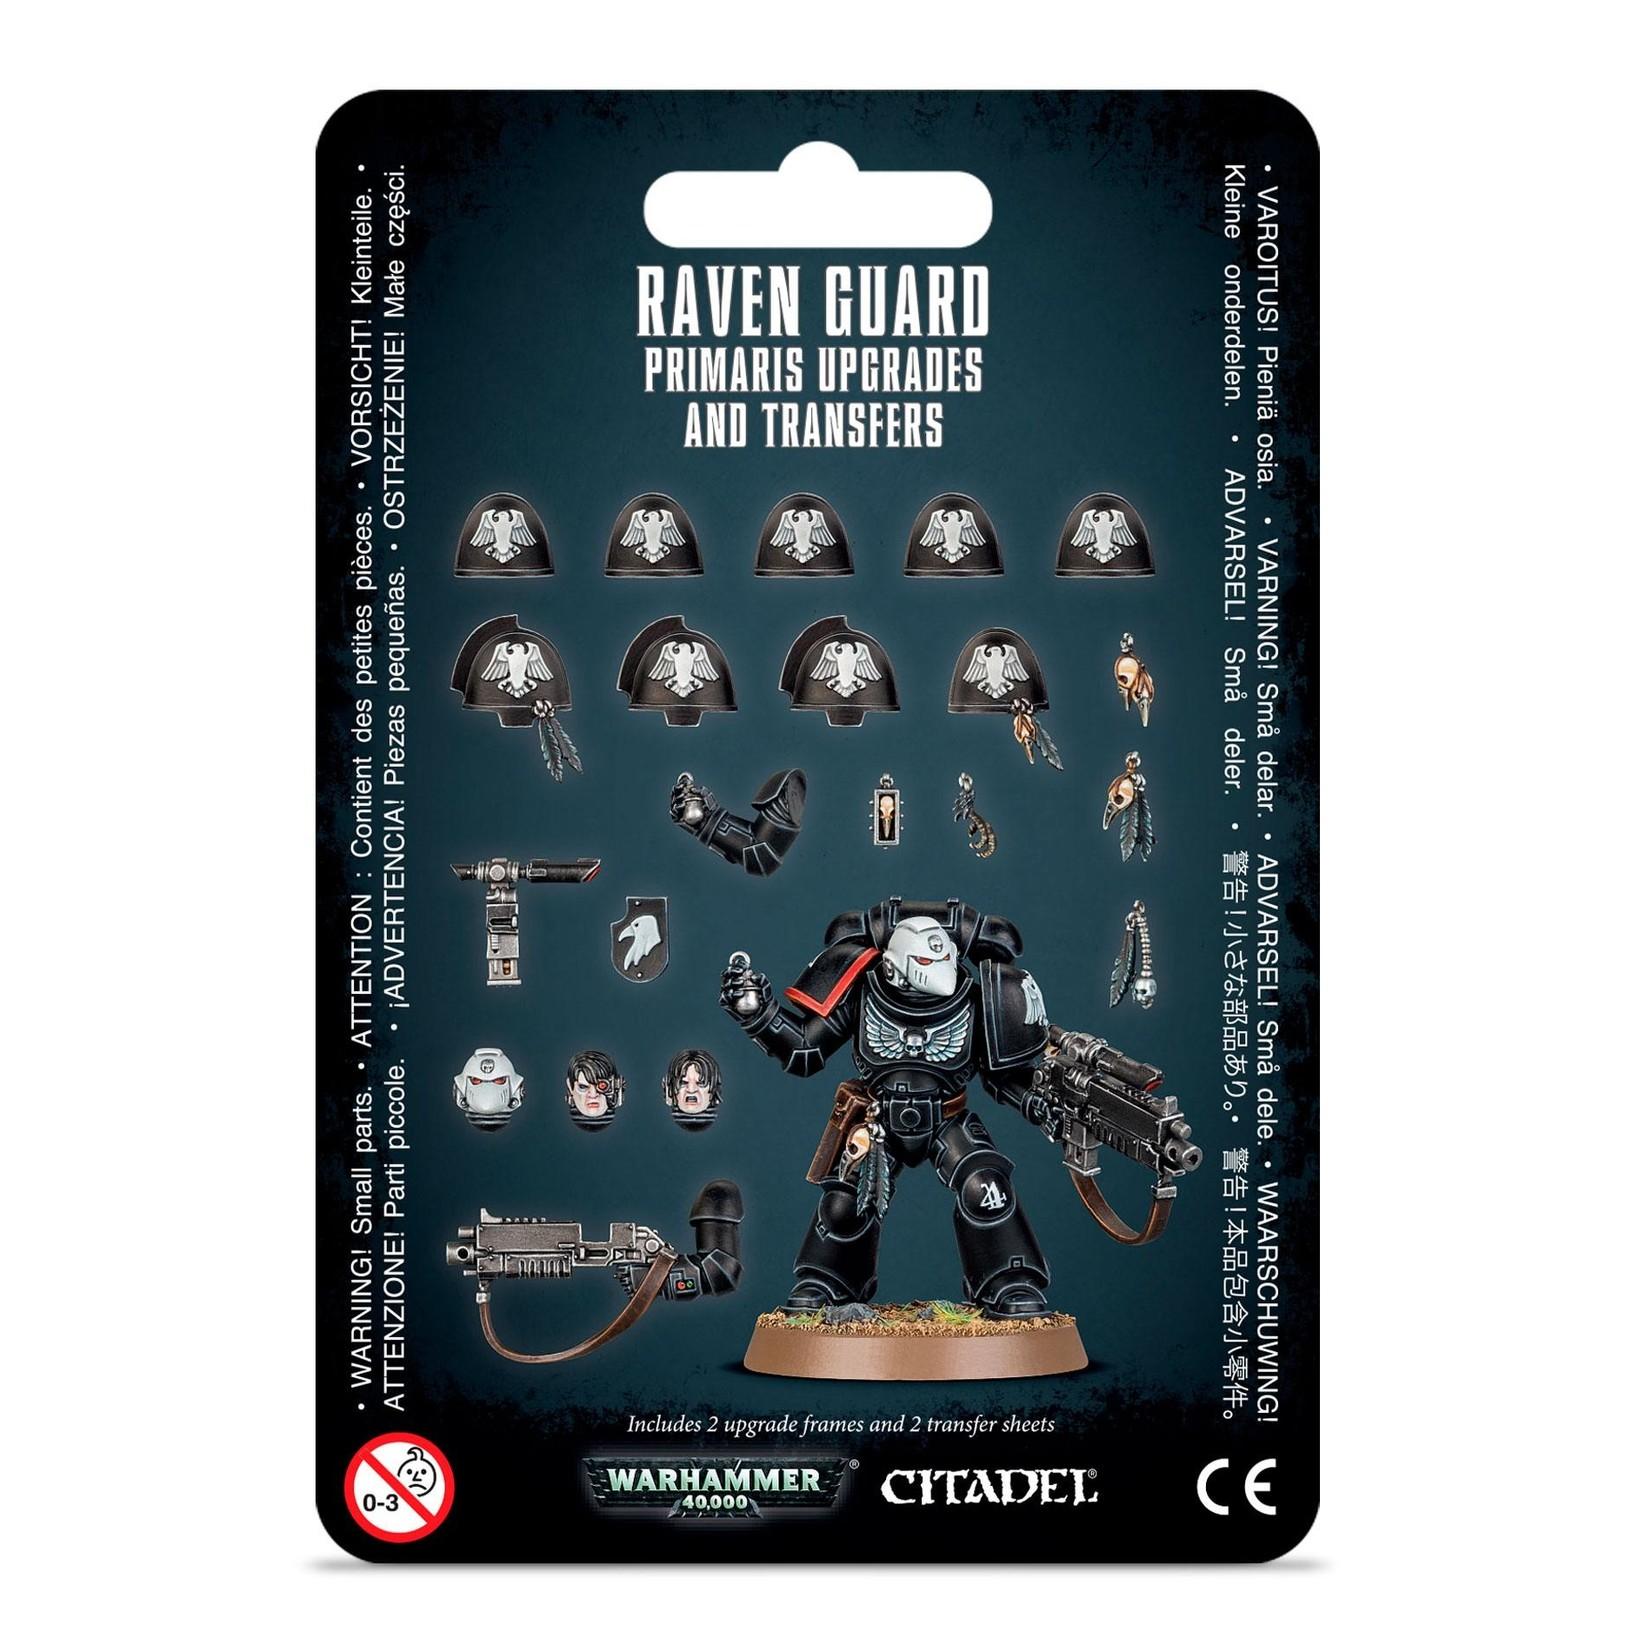 Raven Guard Primaris Upgrades (40K)